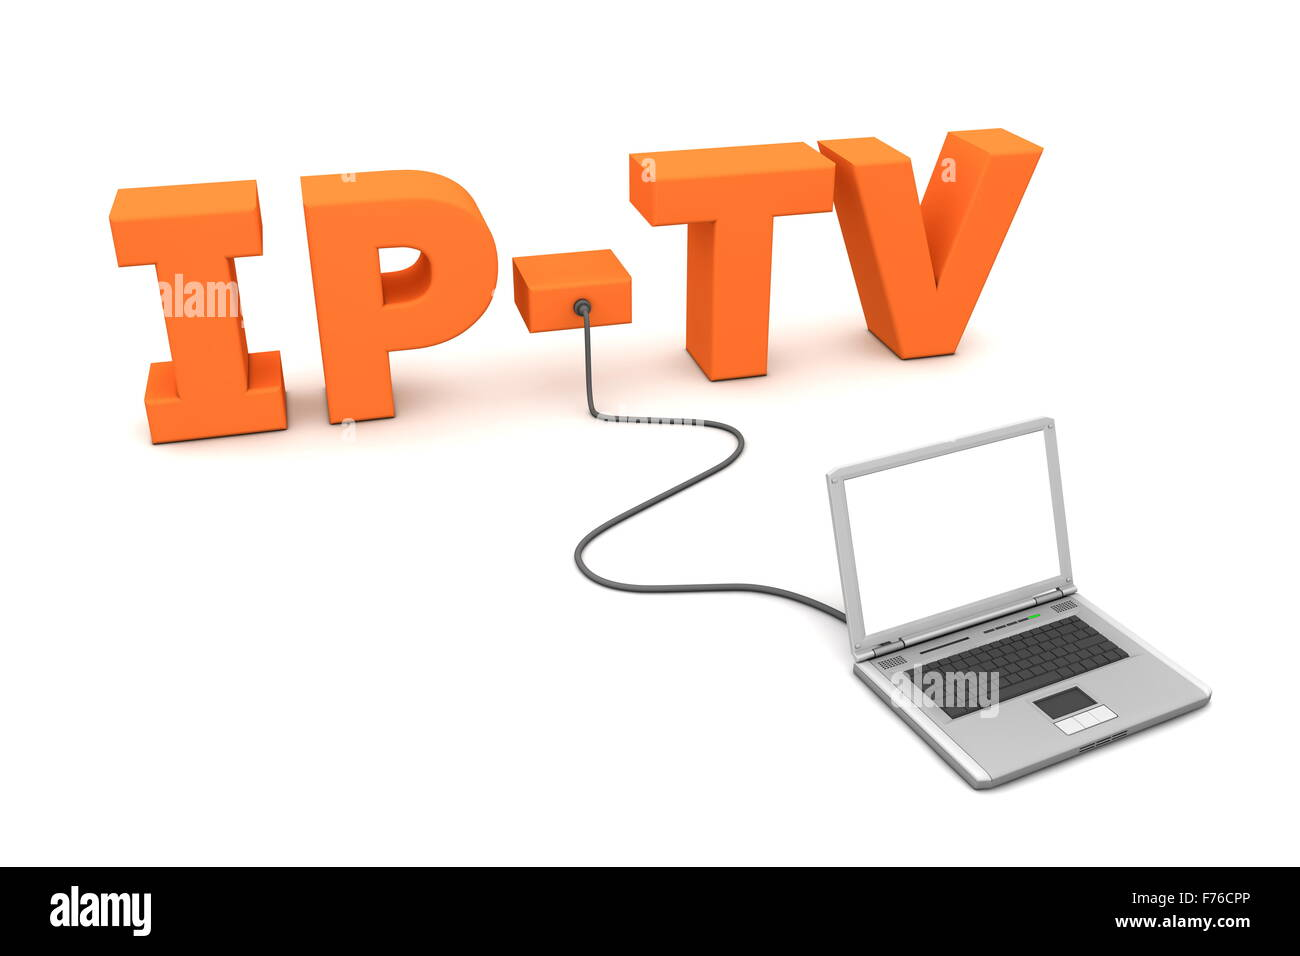 Laptop Wired to IP-TV - Orange Stock Photo, Royalty Free Image ...